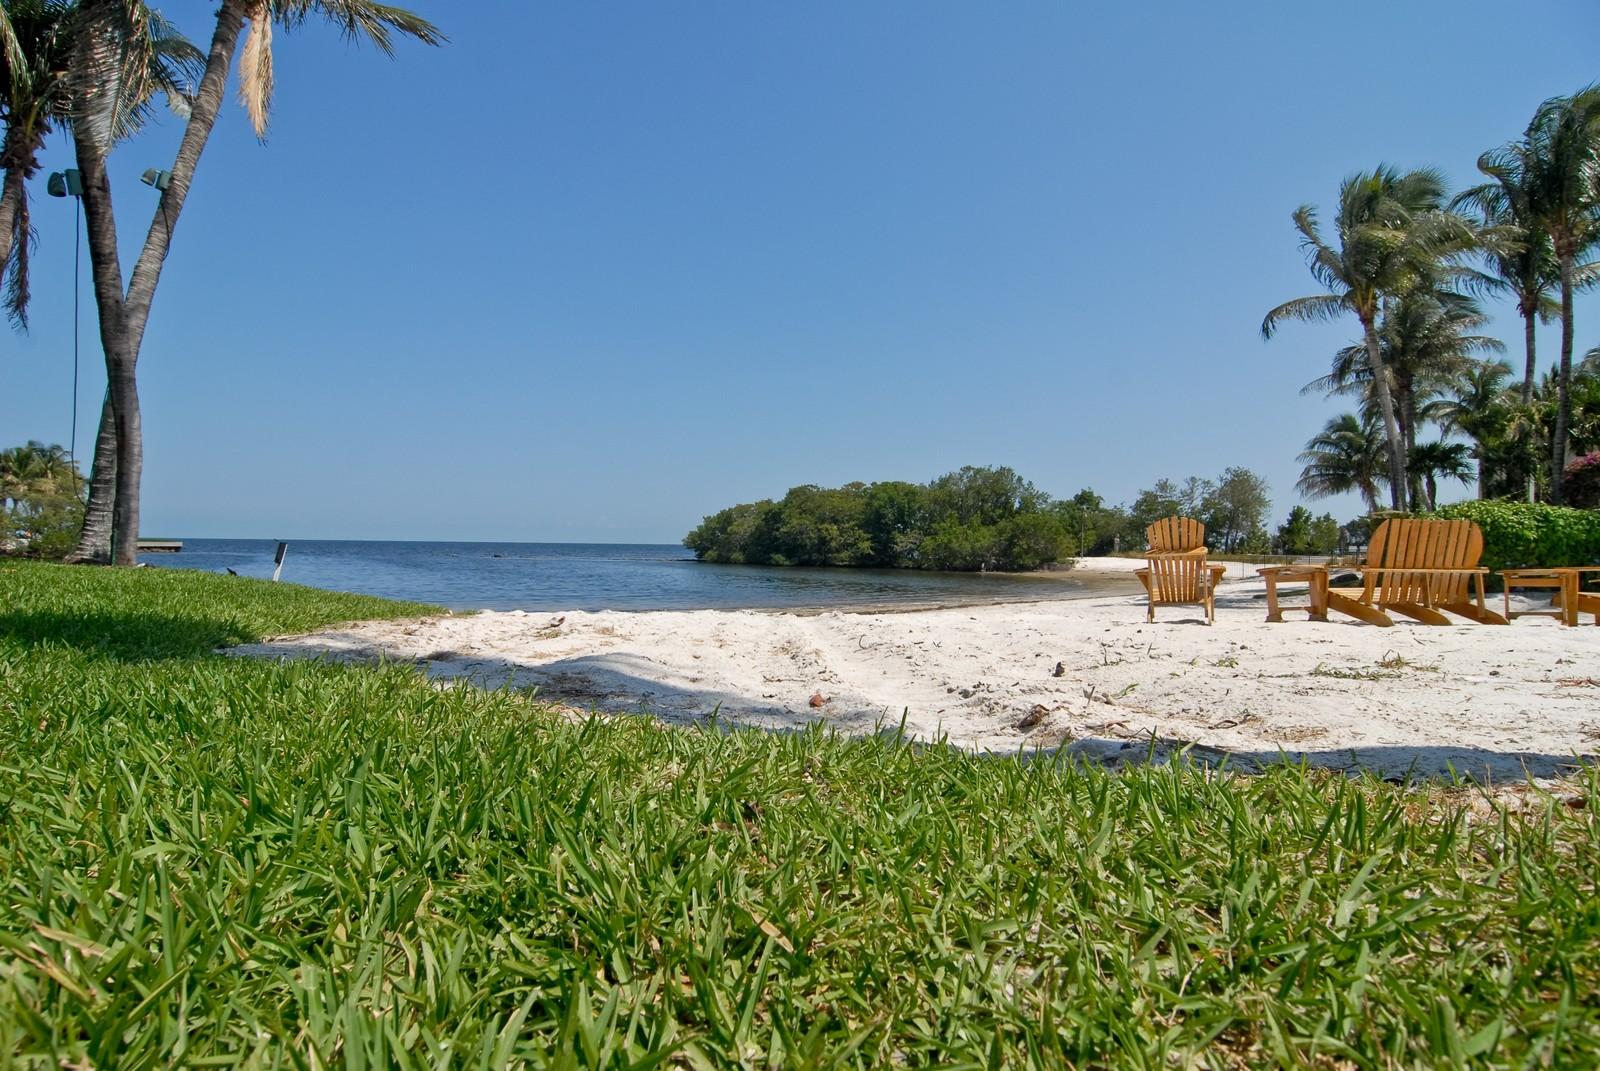 Tahiti Beach C Gables Fl 33143